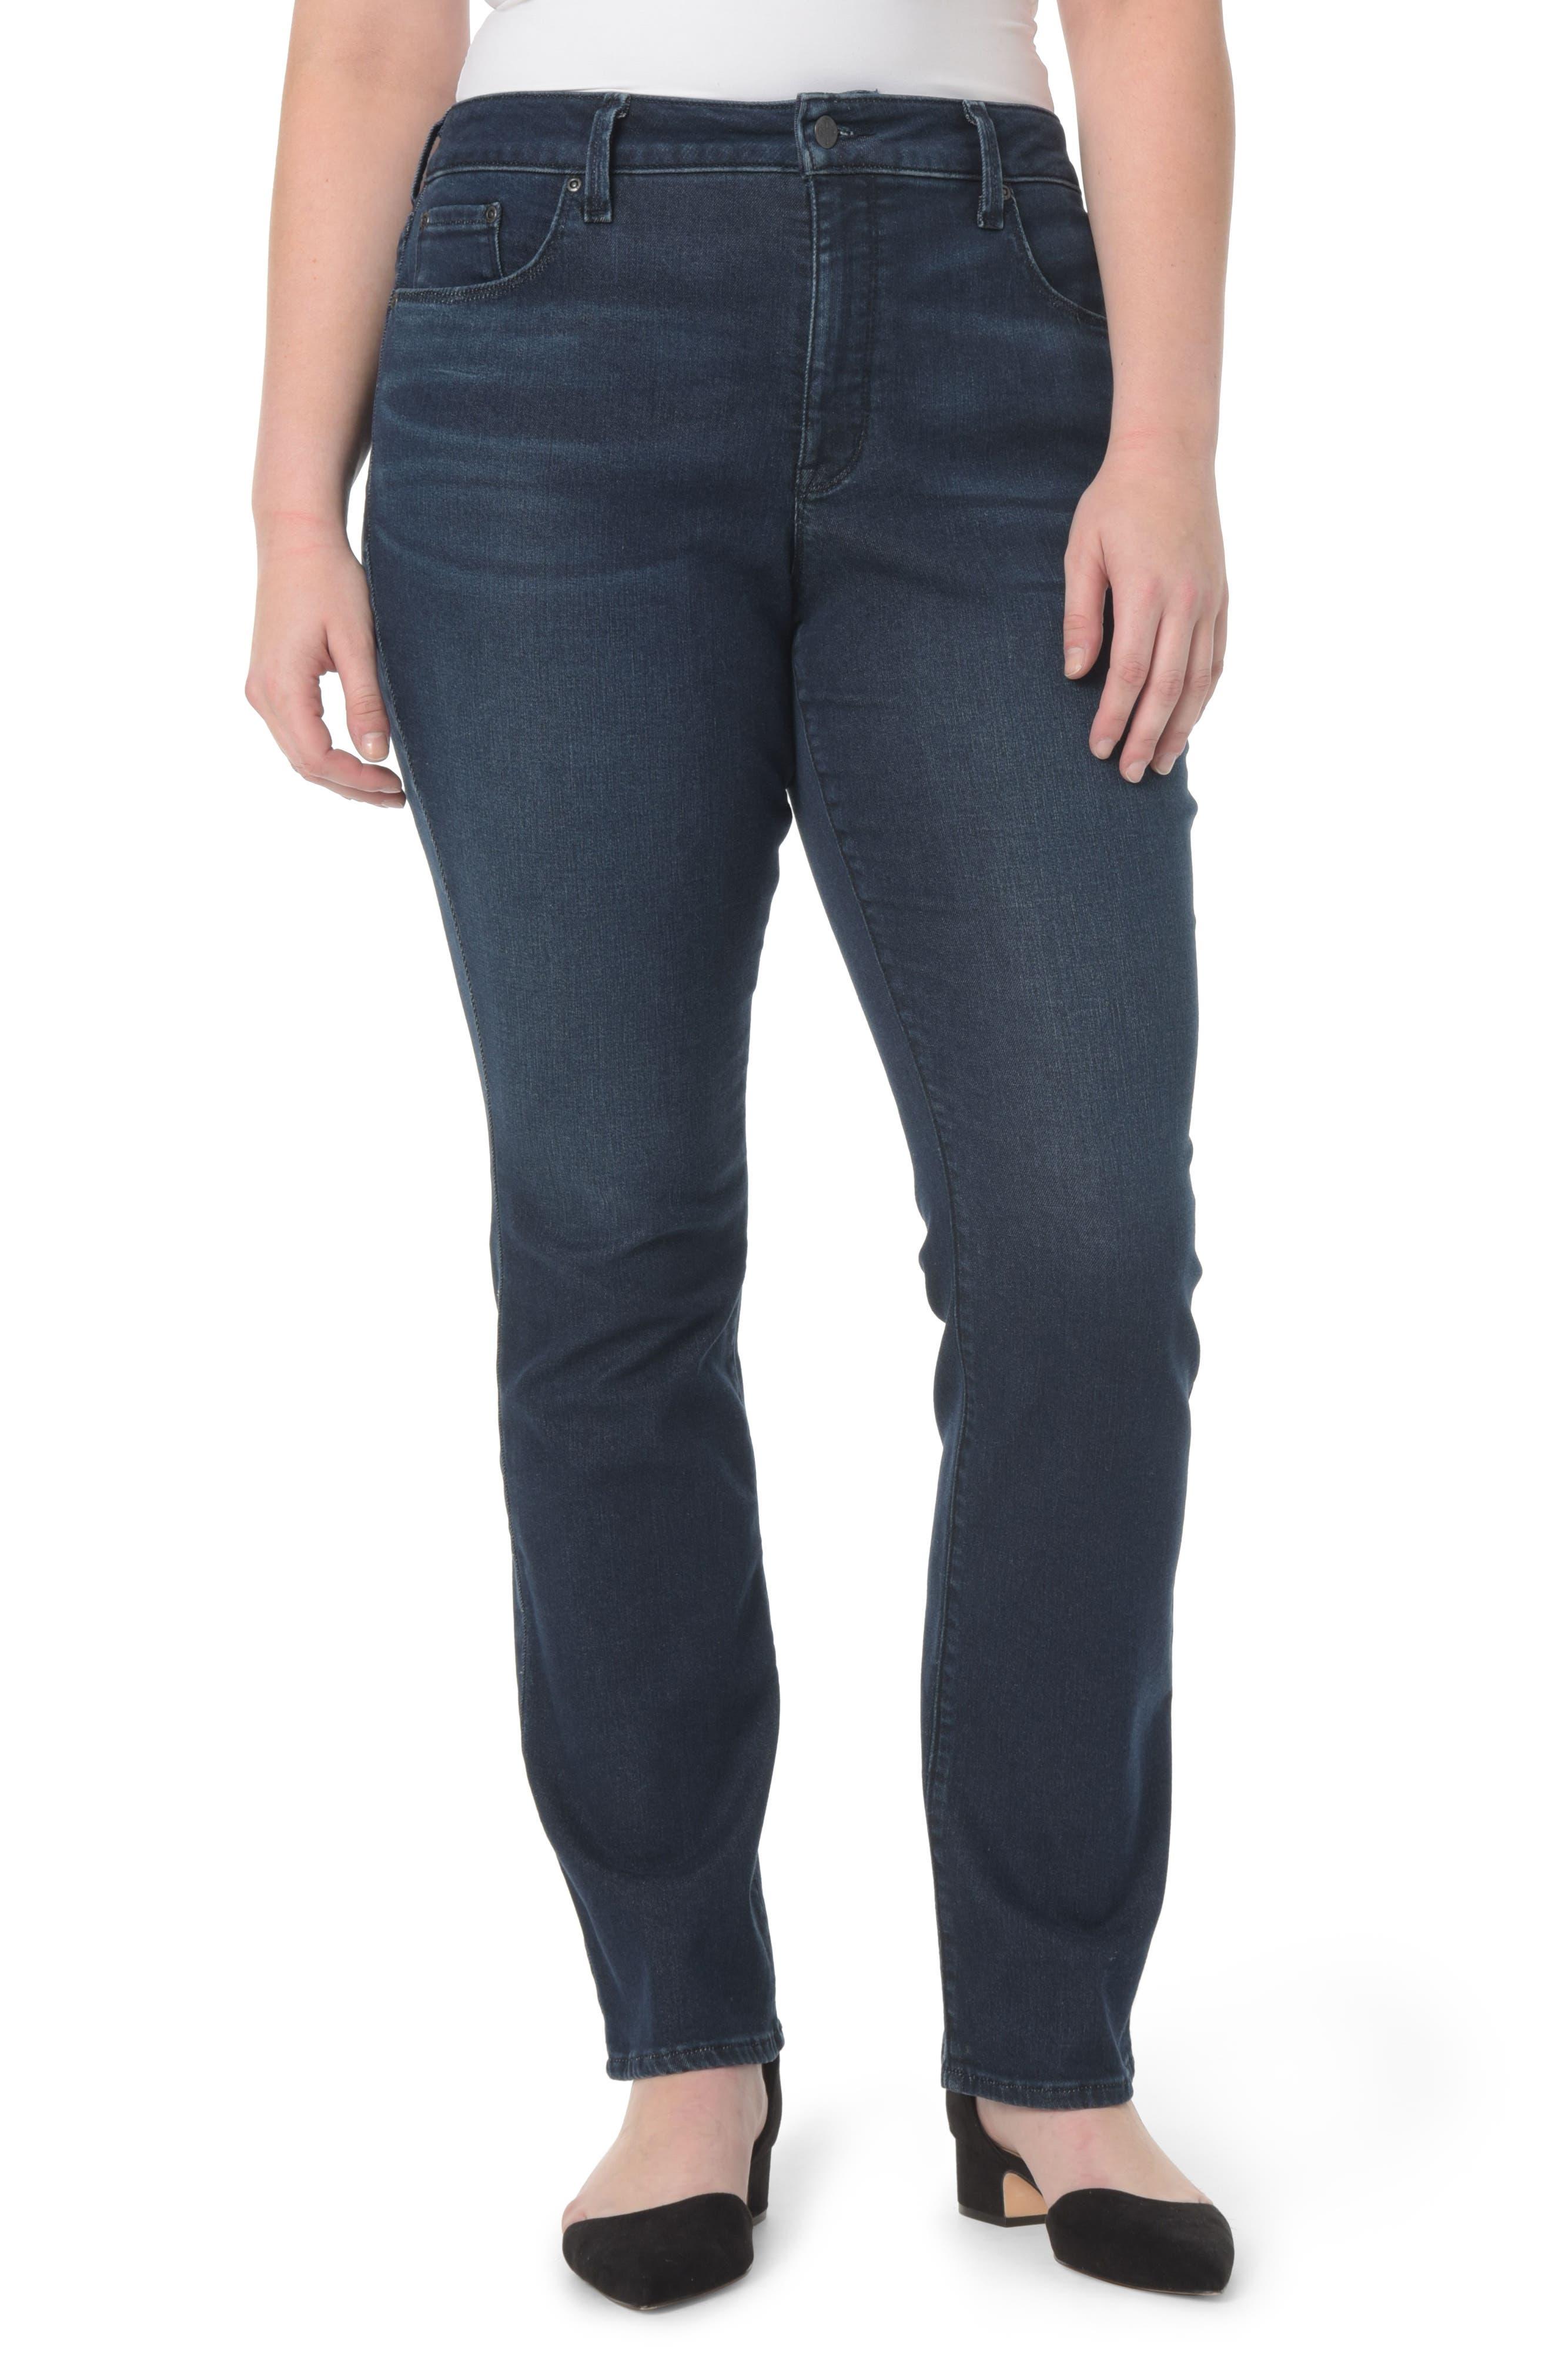 NYDJ Marilyn Stretch Straight Leg Jeans (Morgan) (Plus Size)